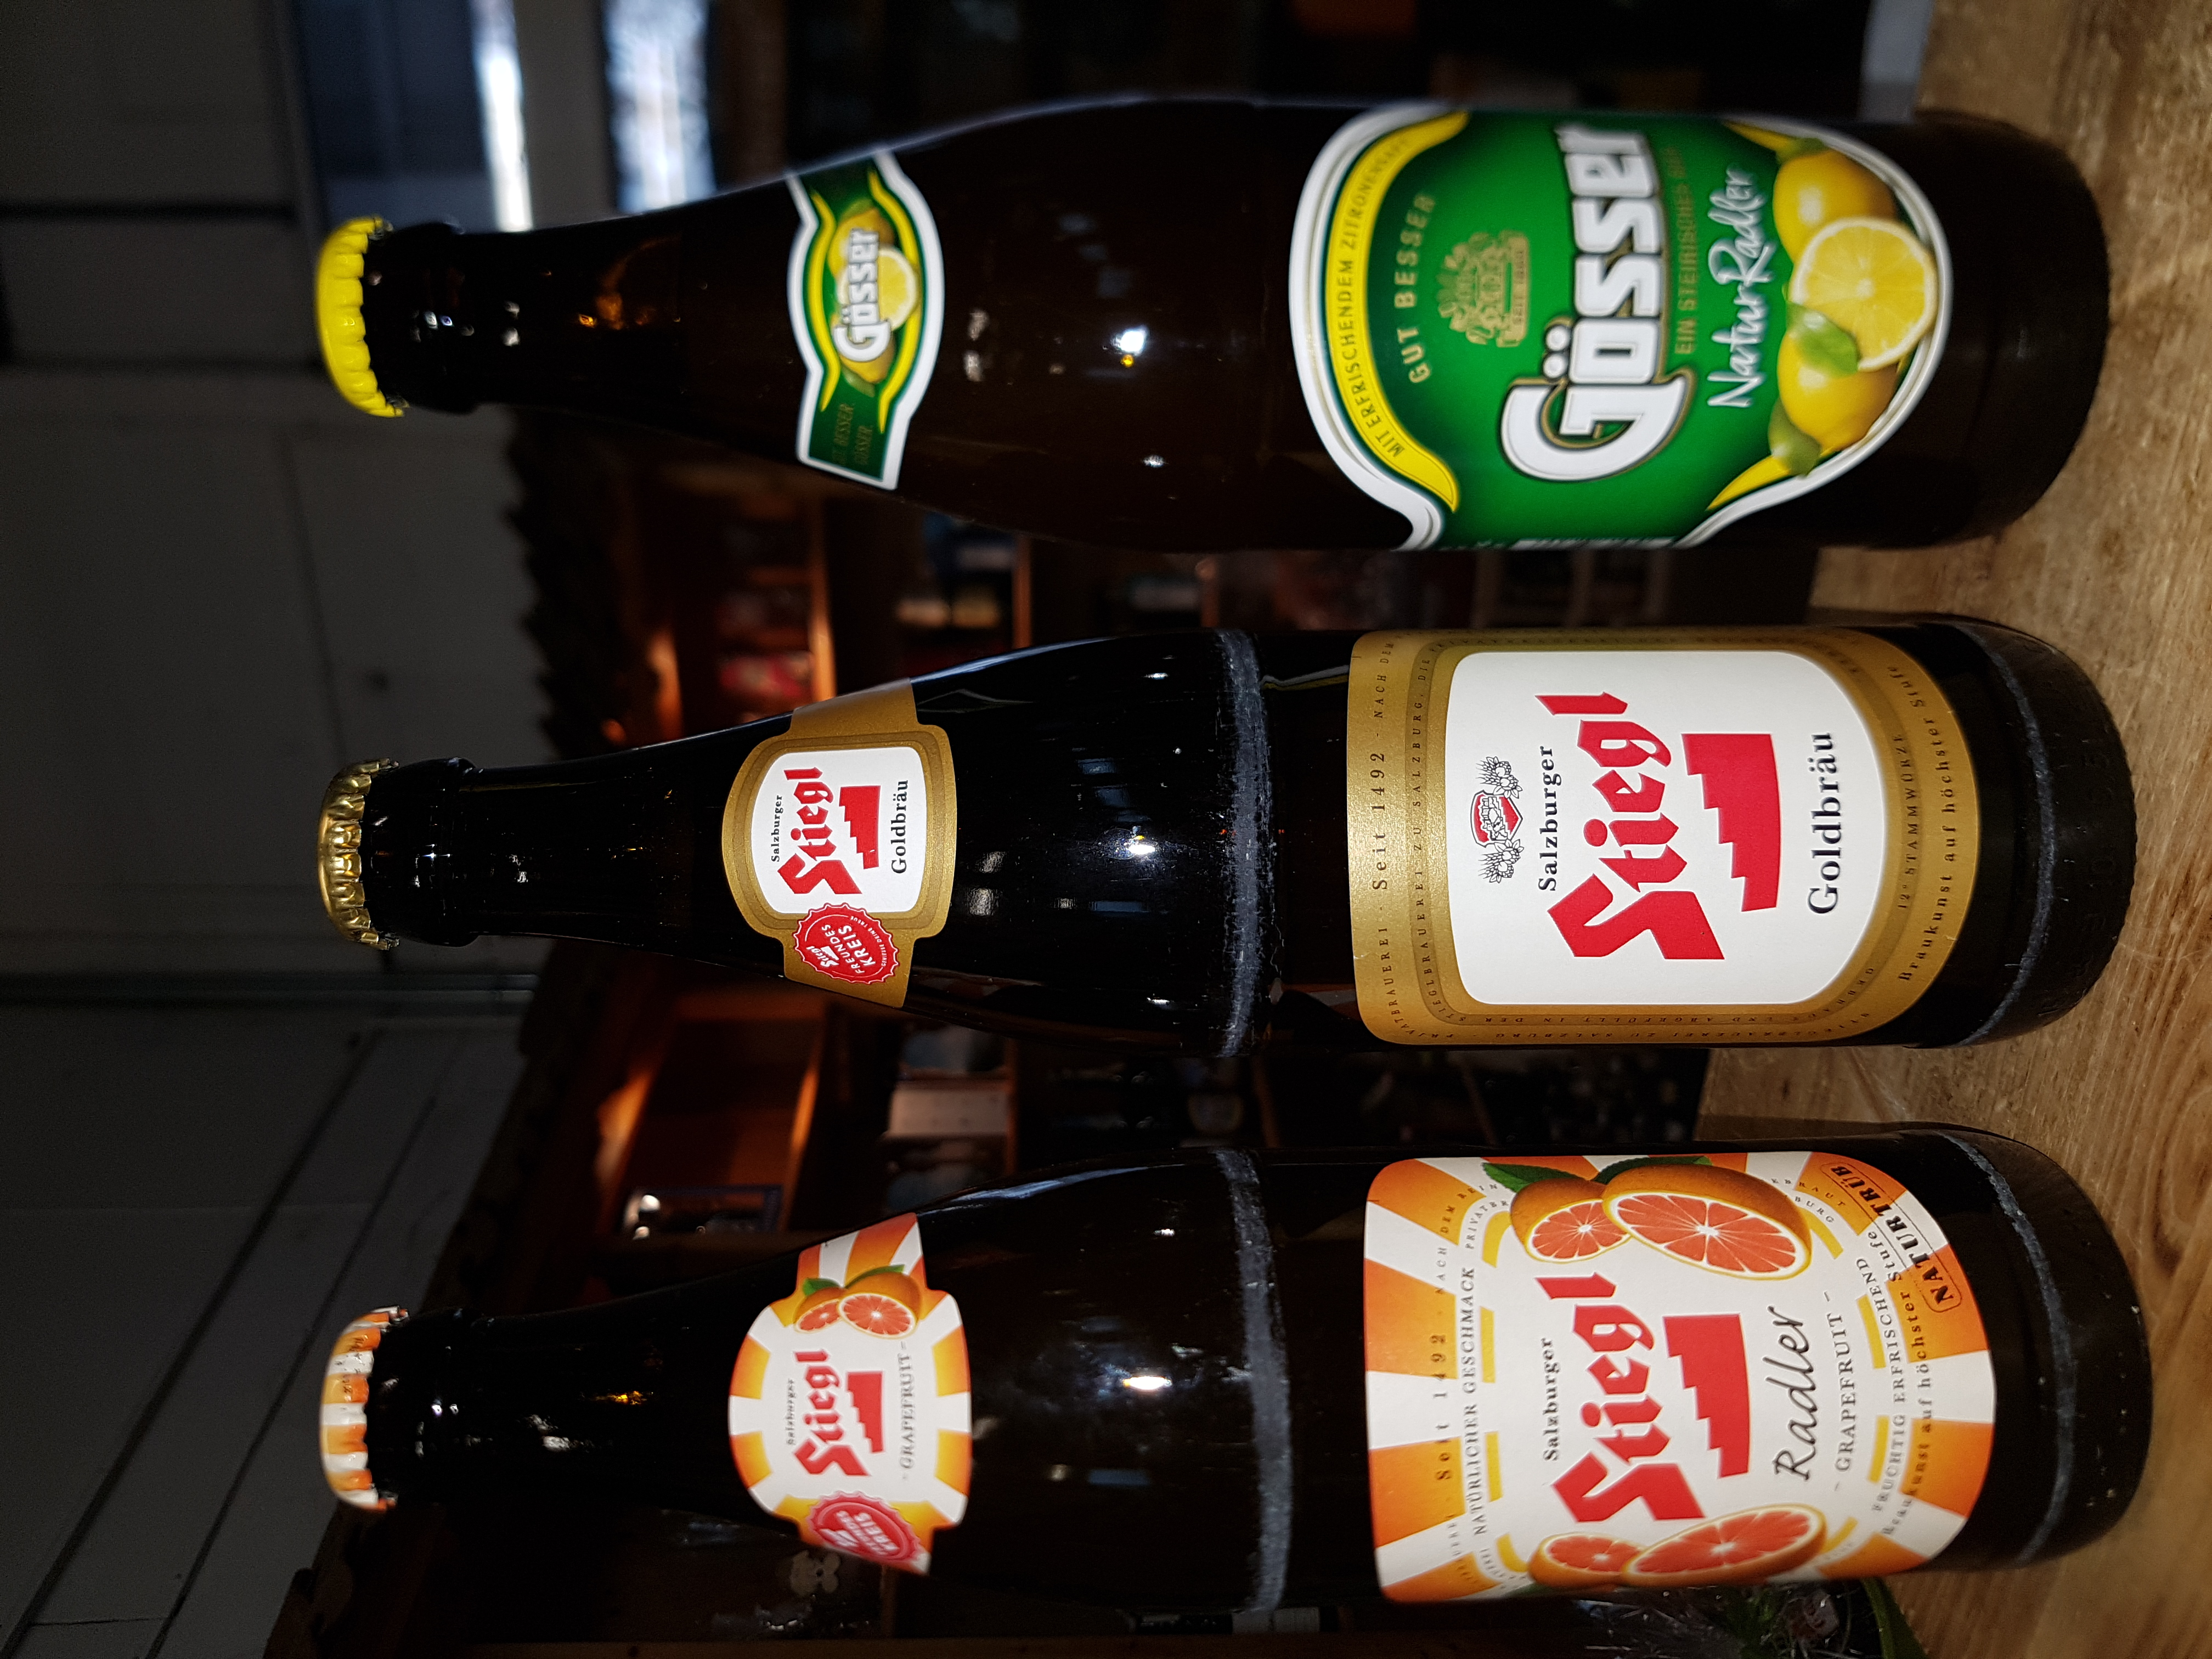 Neu bei uns peter koch getr nkefachmarkt fulda ber for Koch 300 biersorten fulda